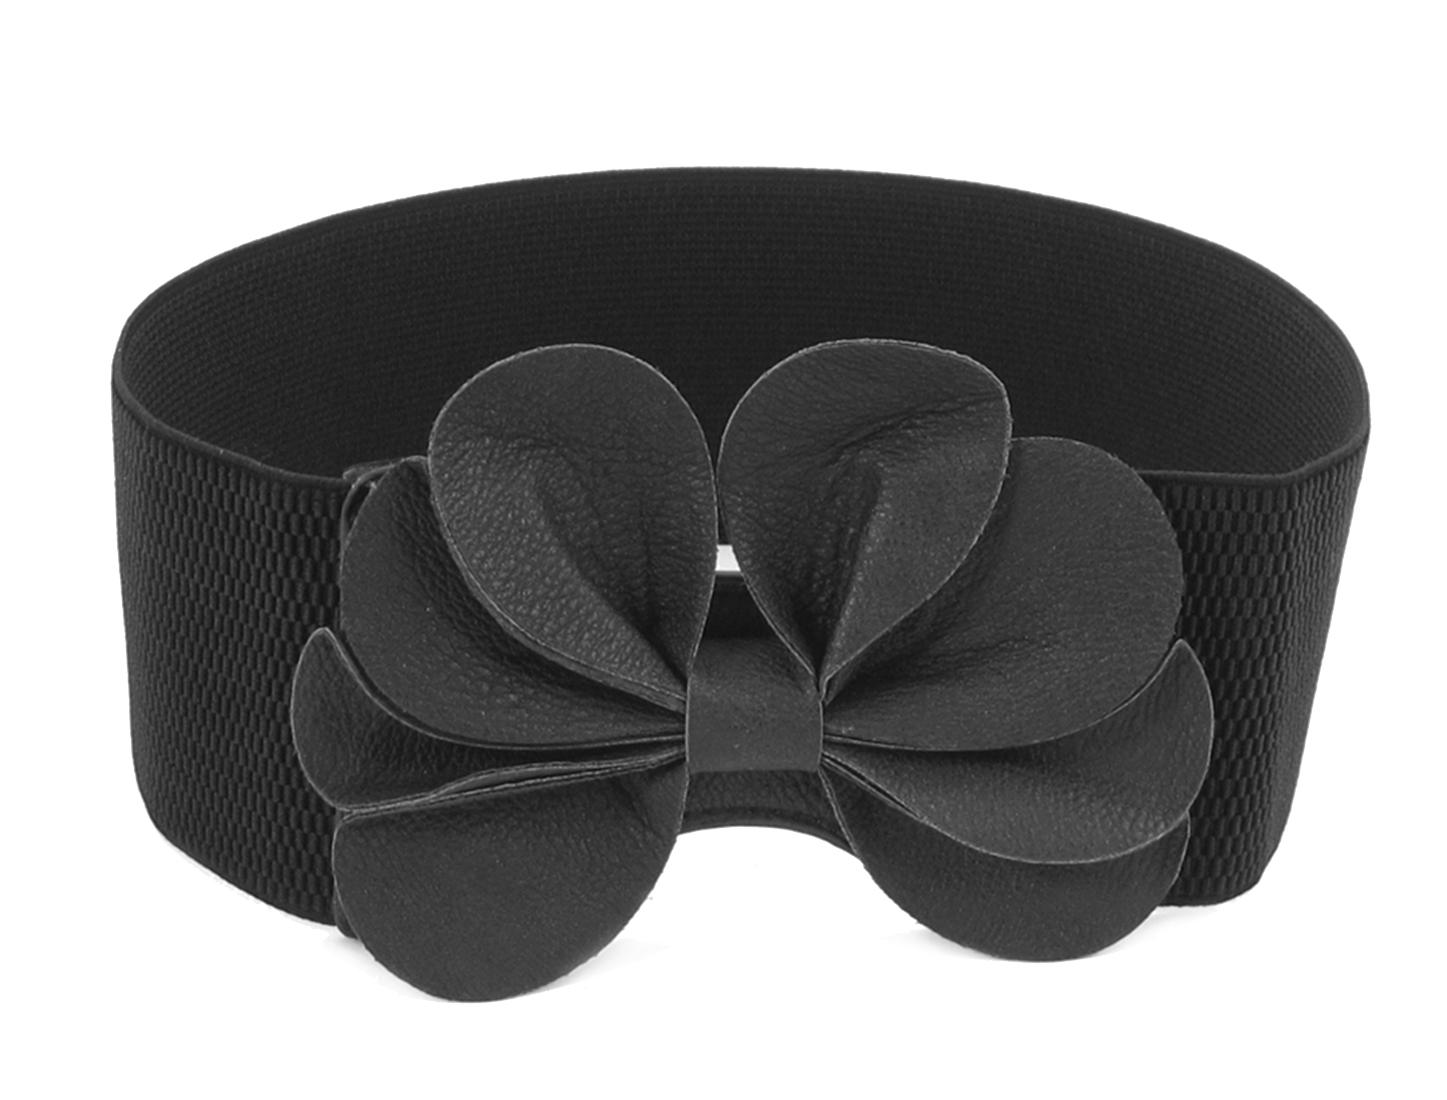 Lady Black Faux Leather Flower Bowknot Decor Buckle Elastic Waist Belt